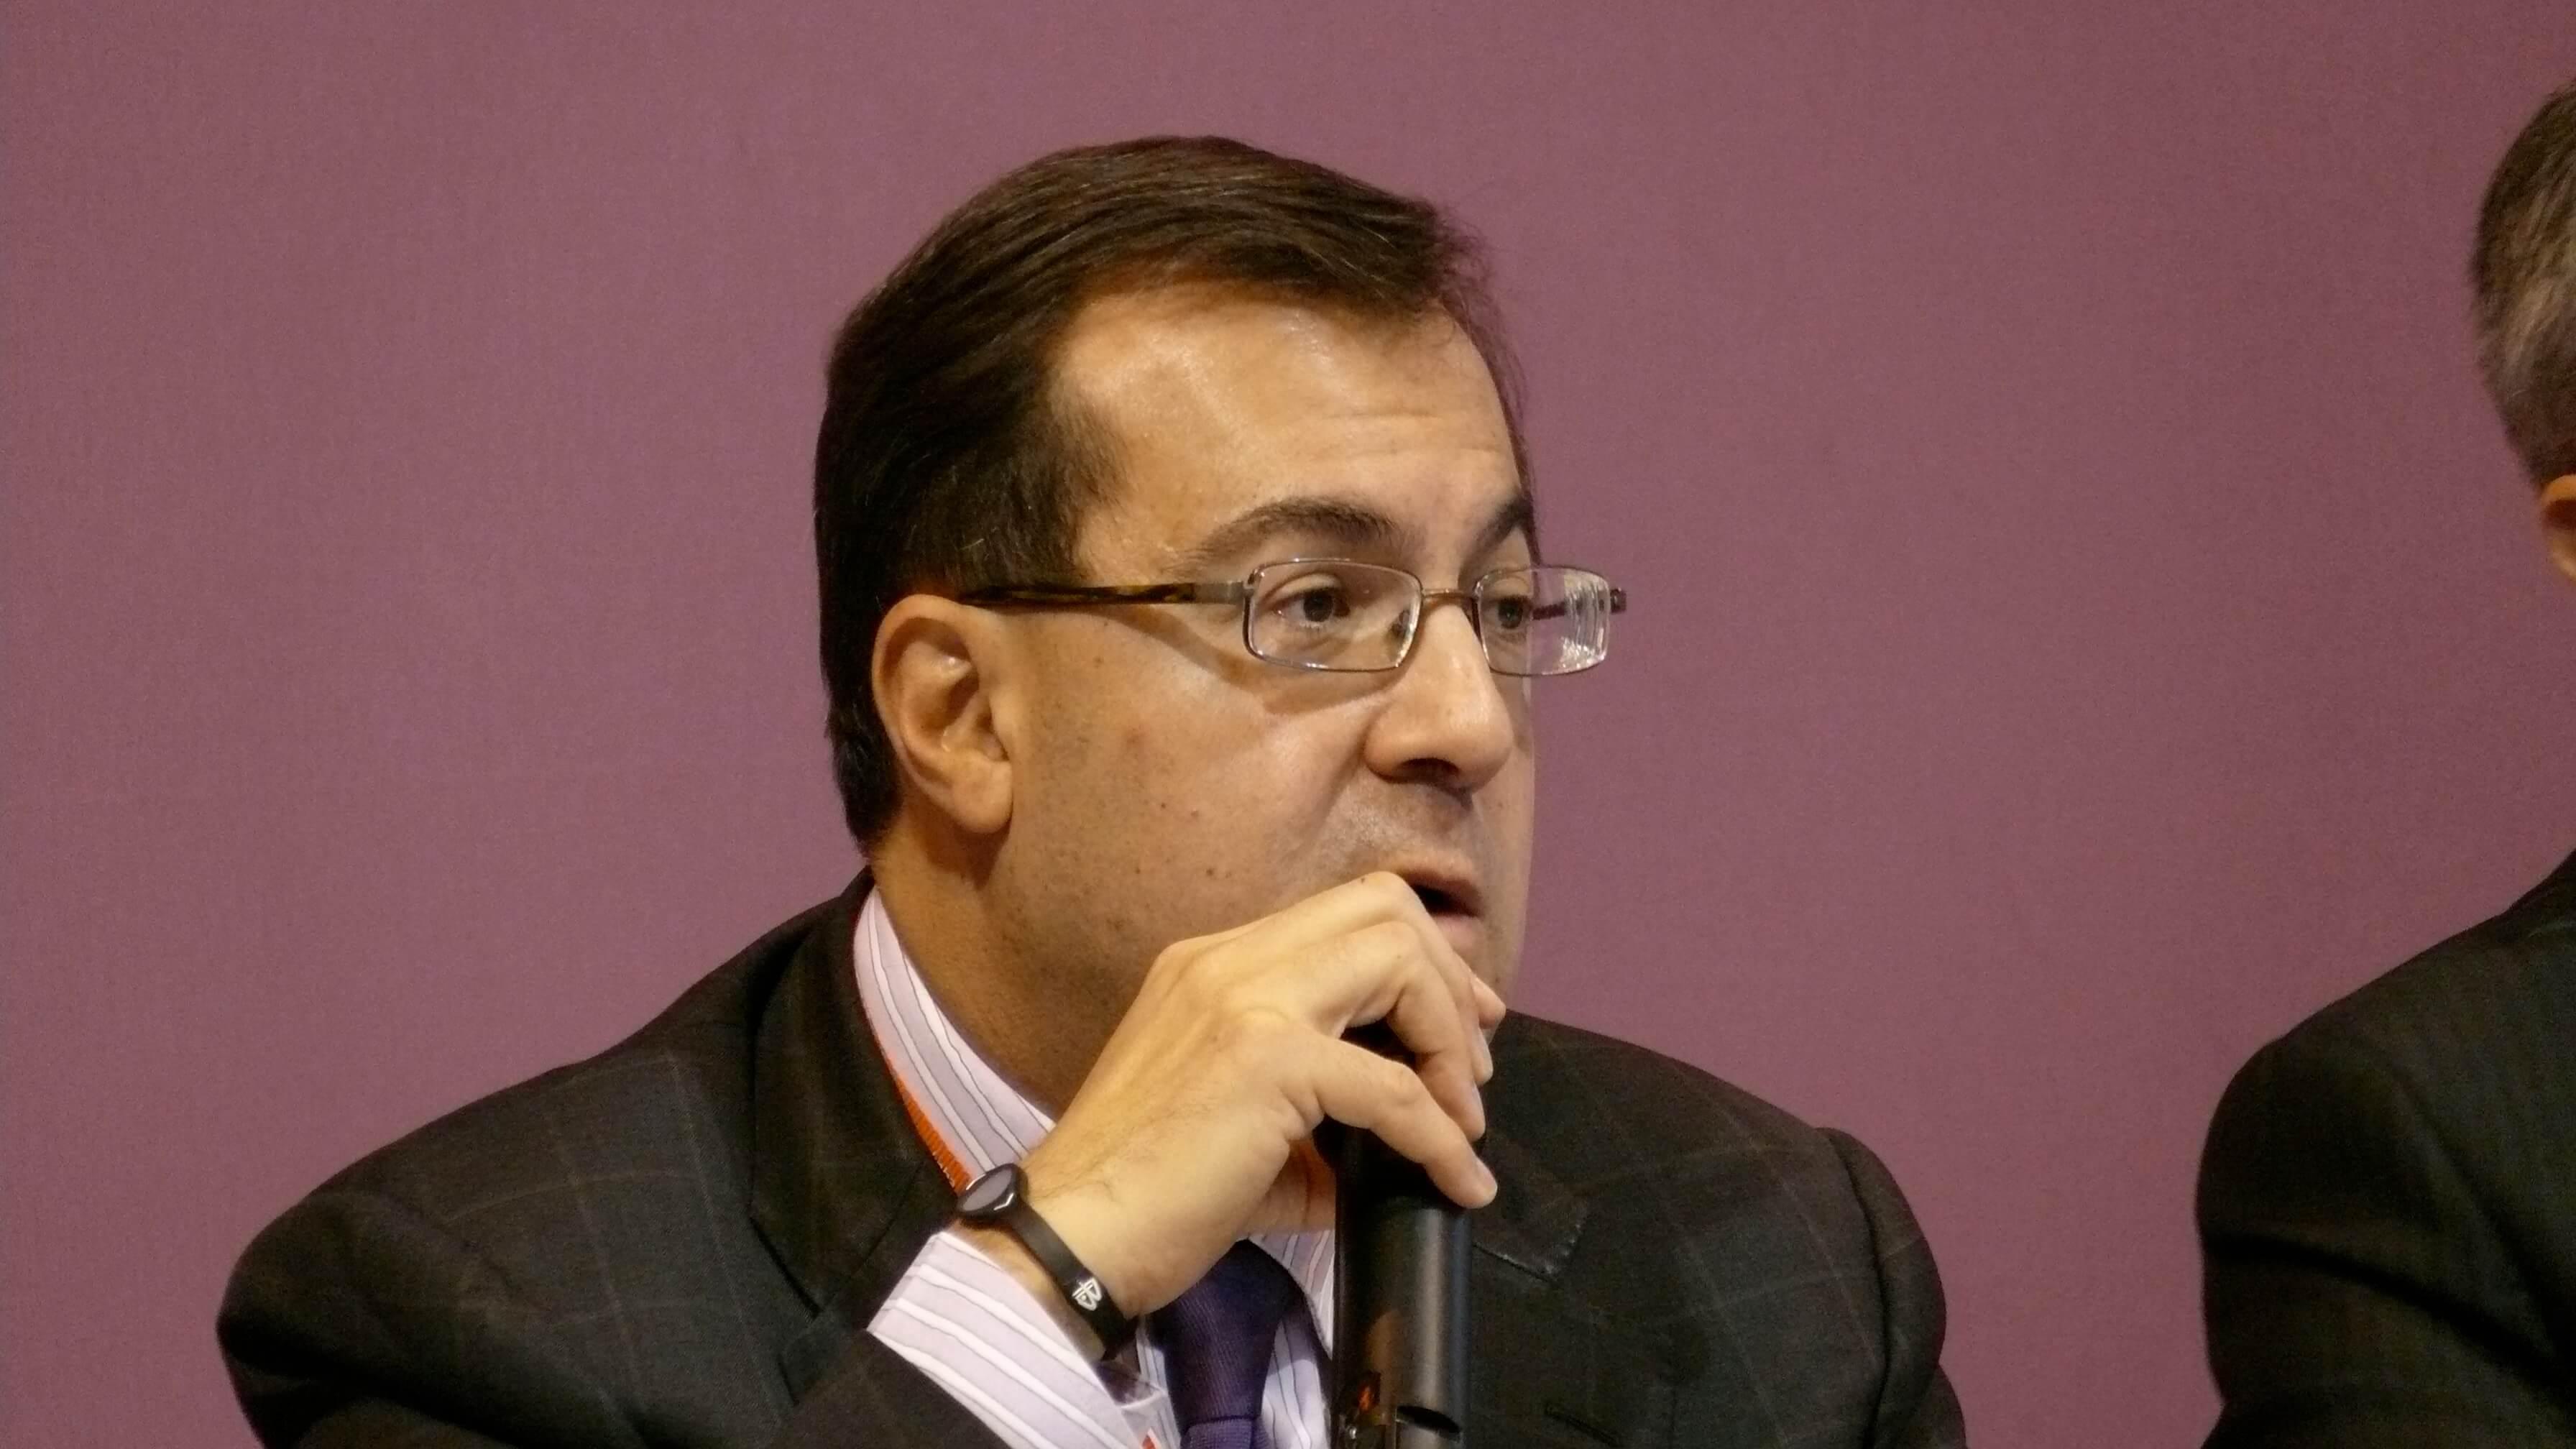 Olivier SAFAR